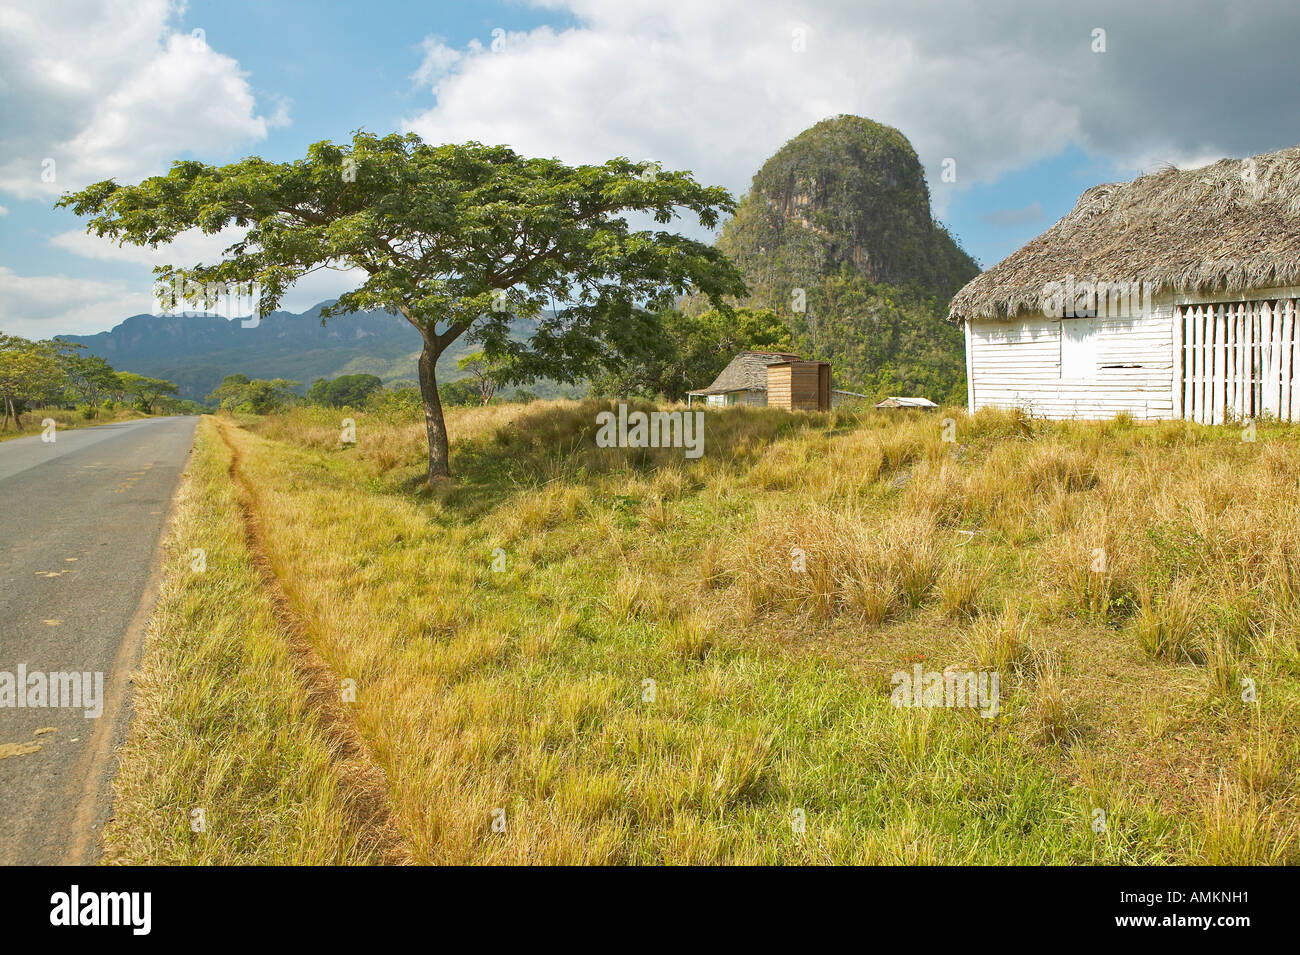 The Valle de Viñales in central Cuba - Stock Image